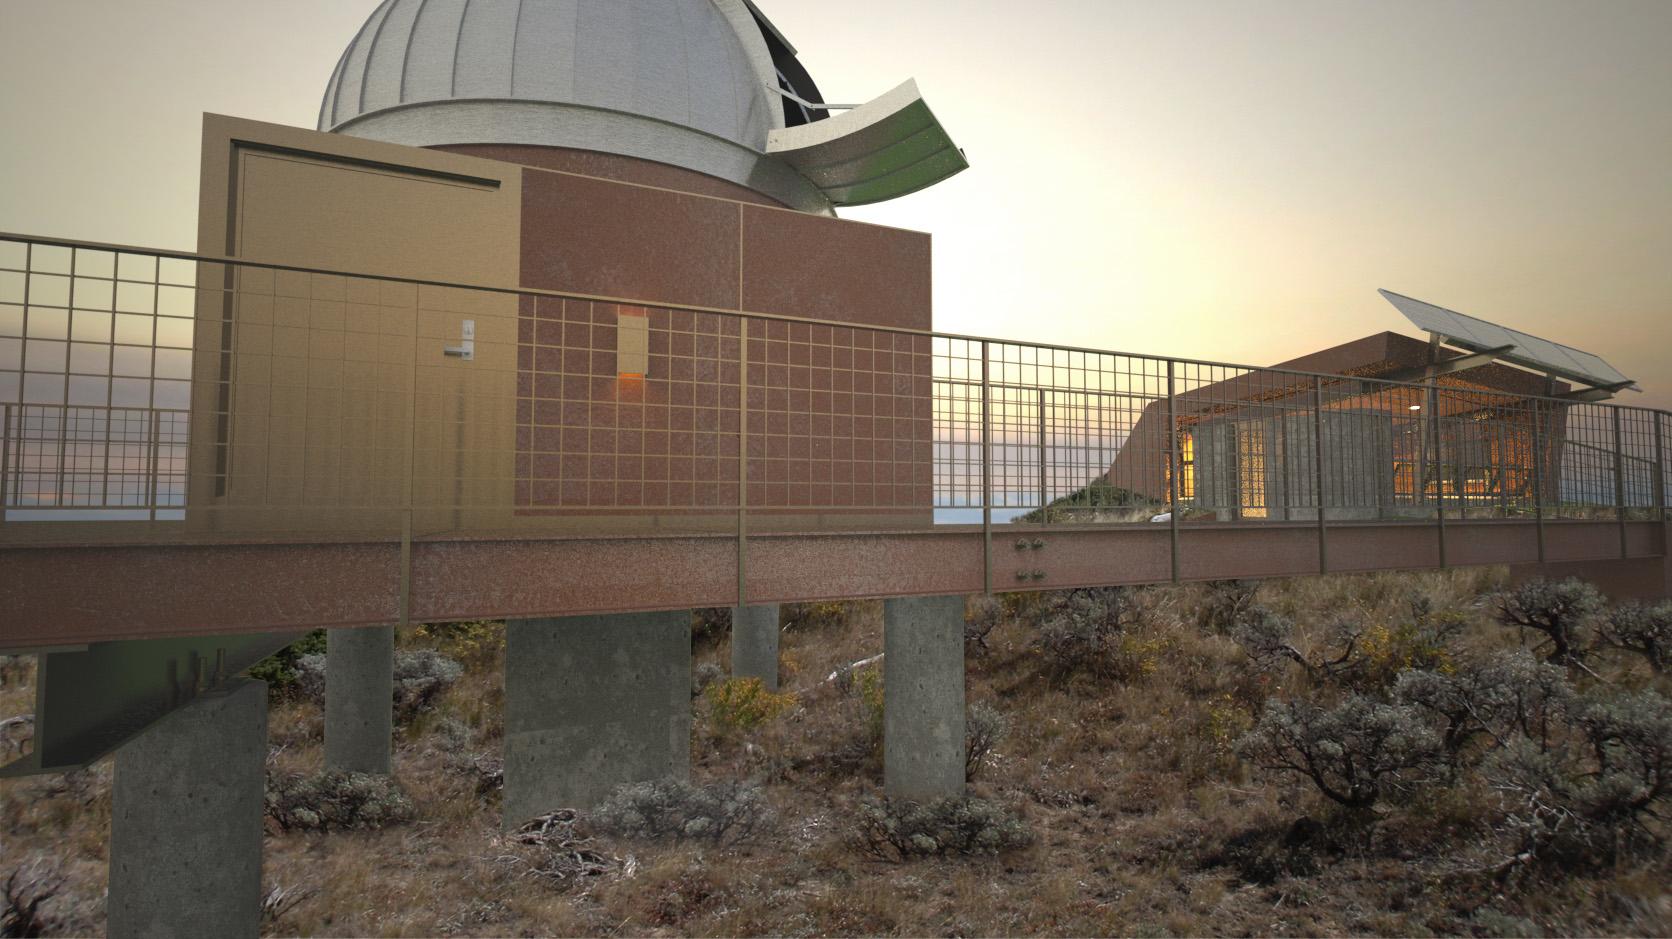 Passive Solar Atchitecture Observatory - 14.jpg